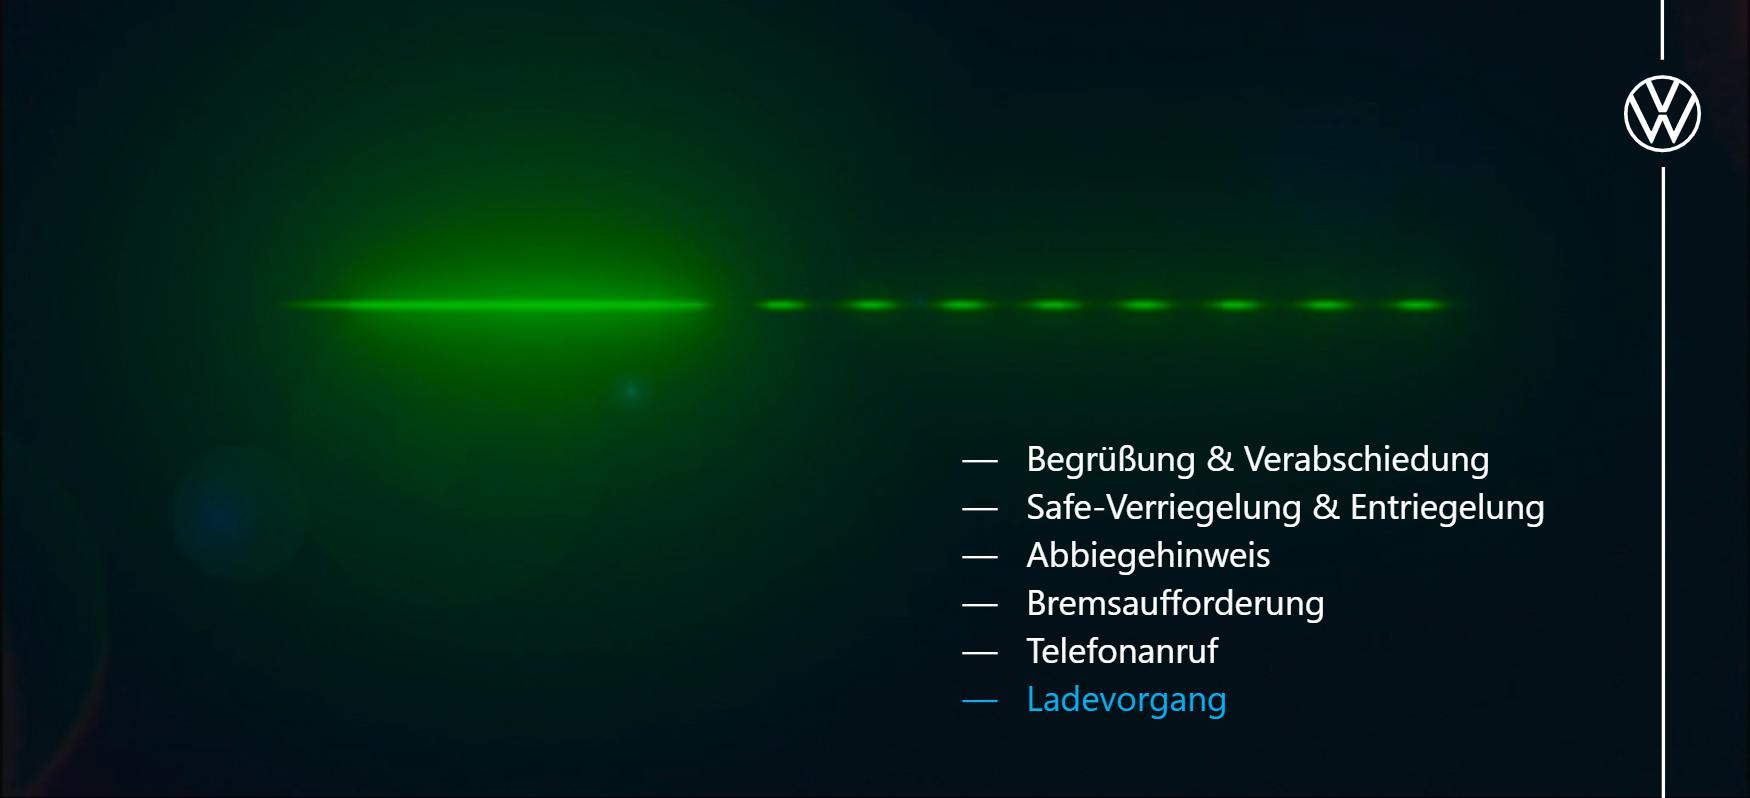 led-id3.jpg